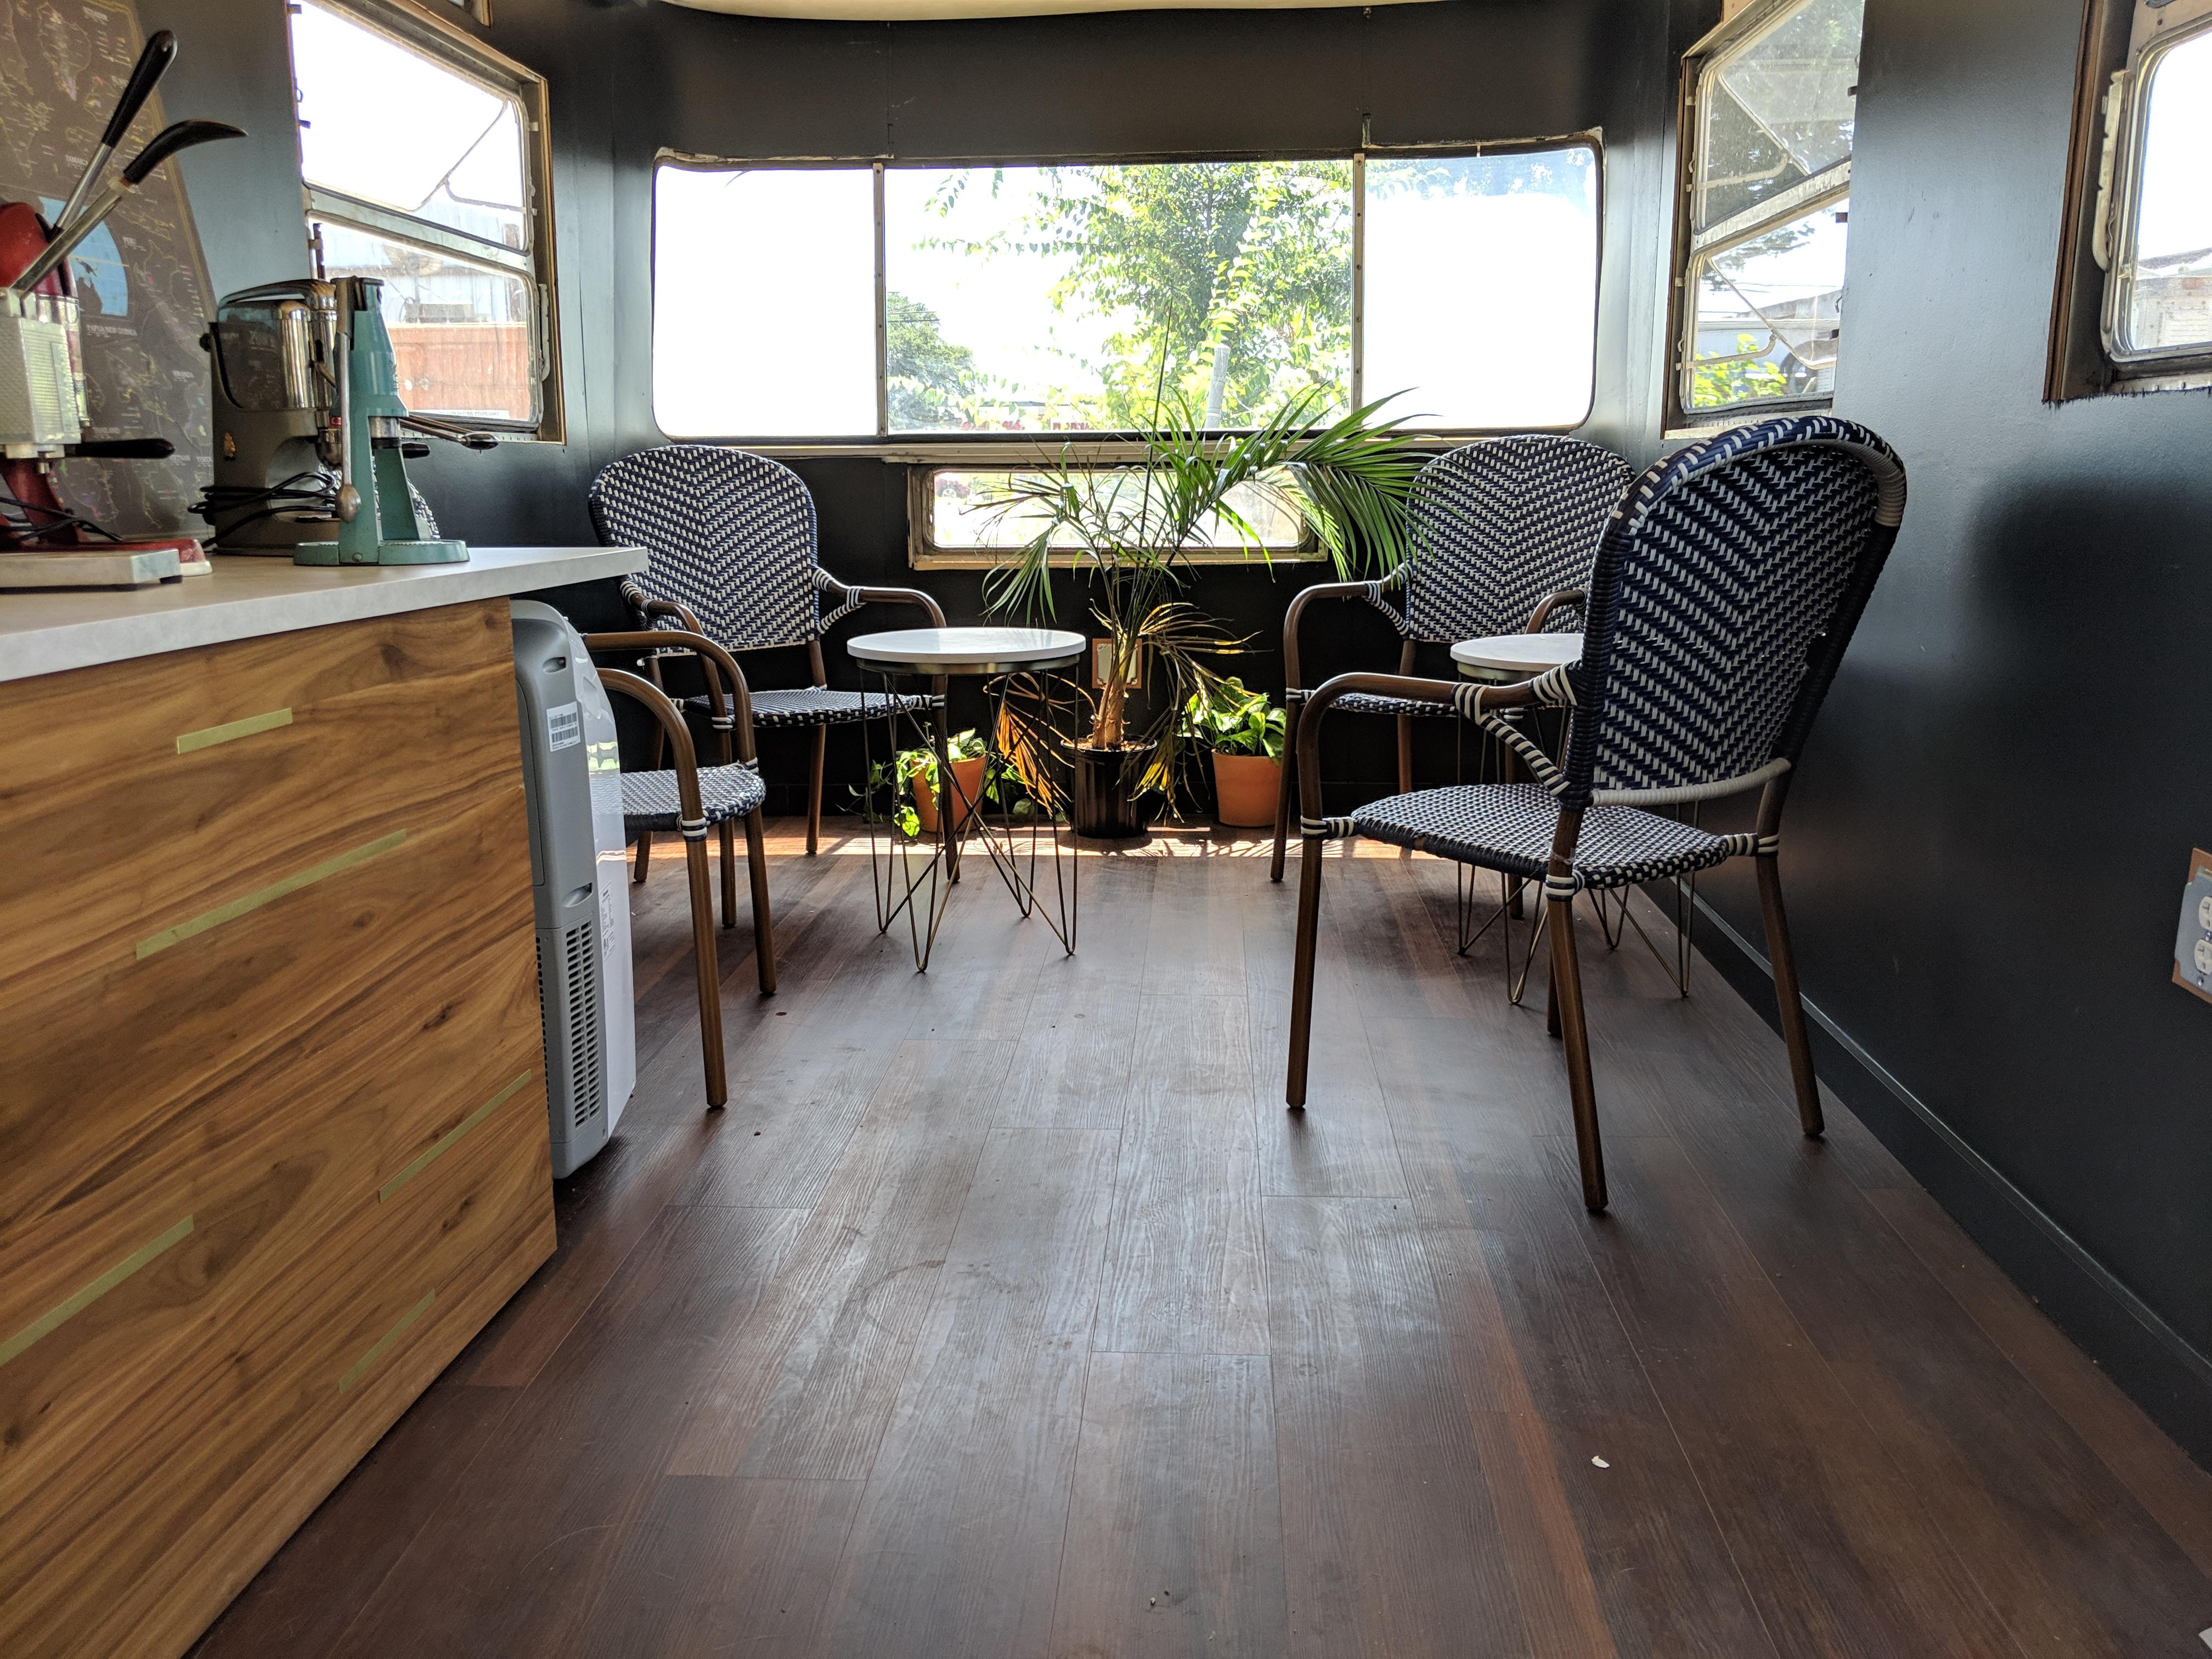 LeverCraft Coffee's space